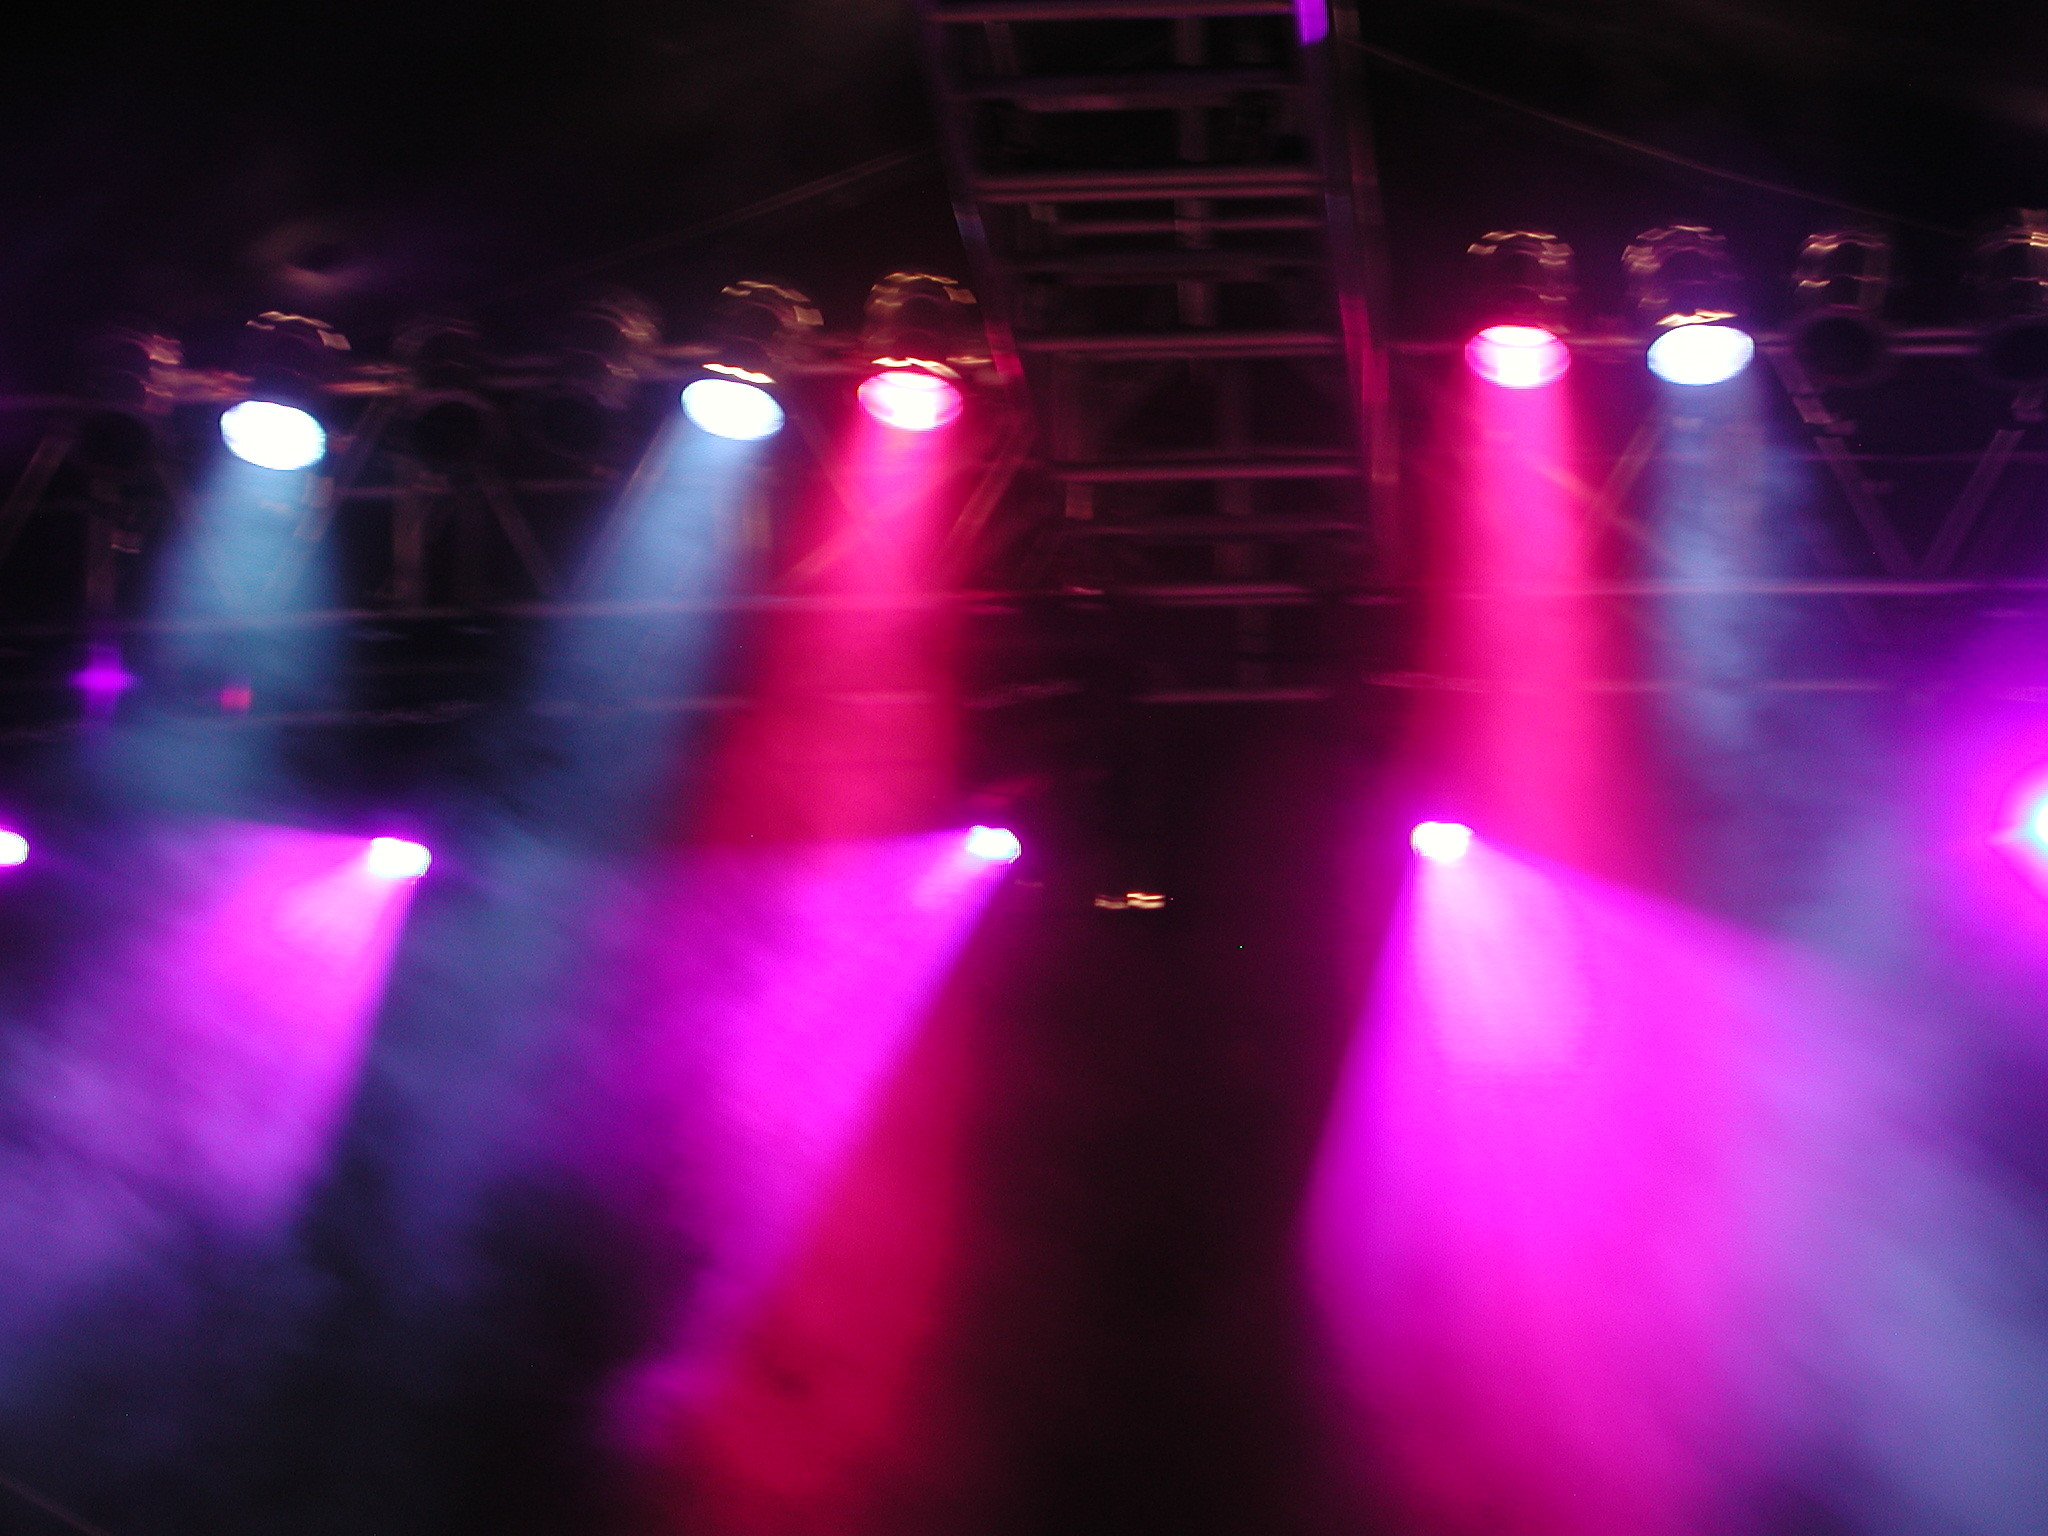 2048x1536 Concert Lights Wallpaper Stage Lighting By Publicarte